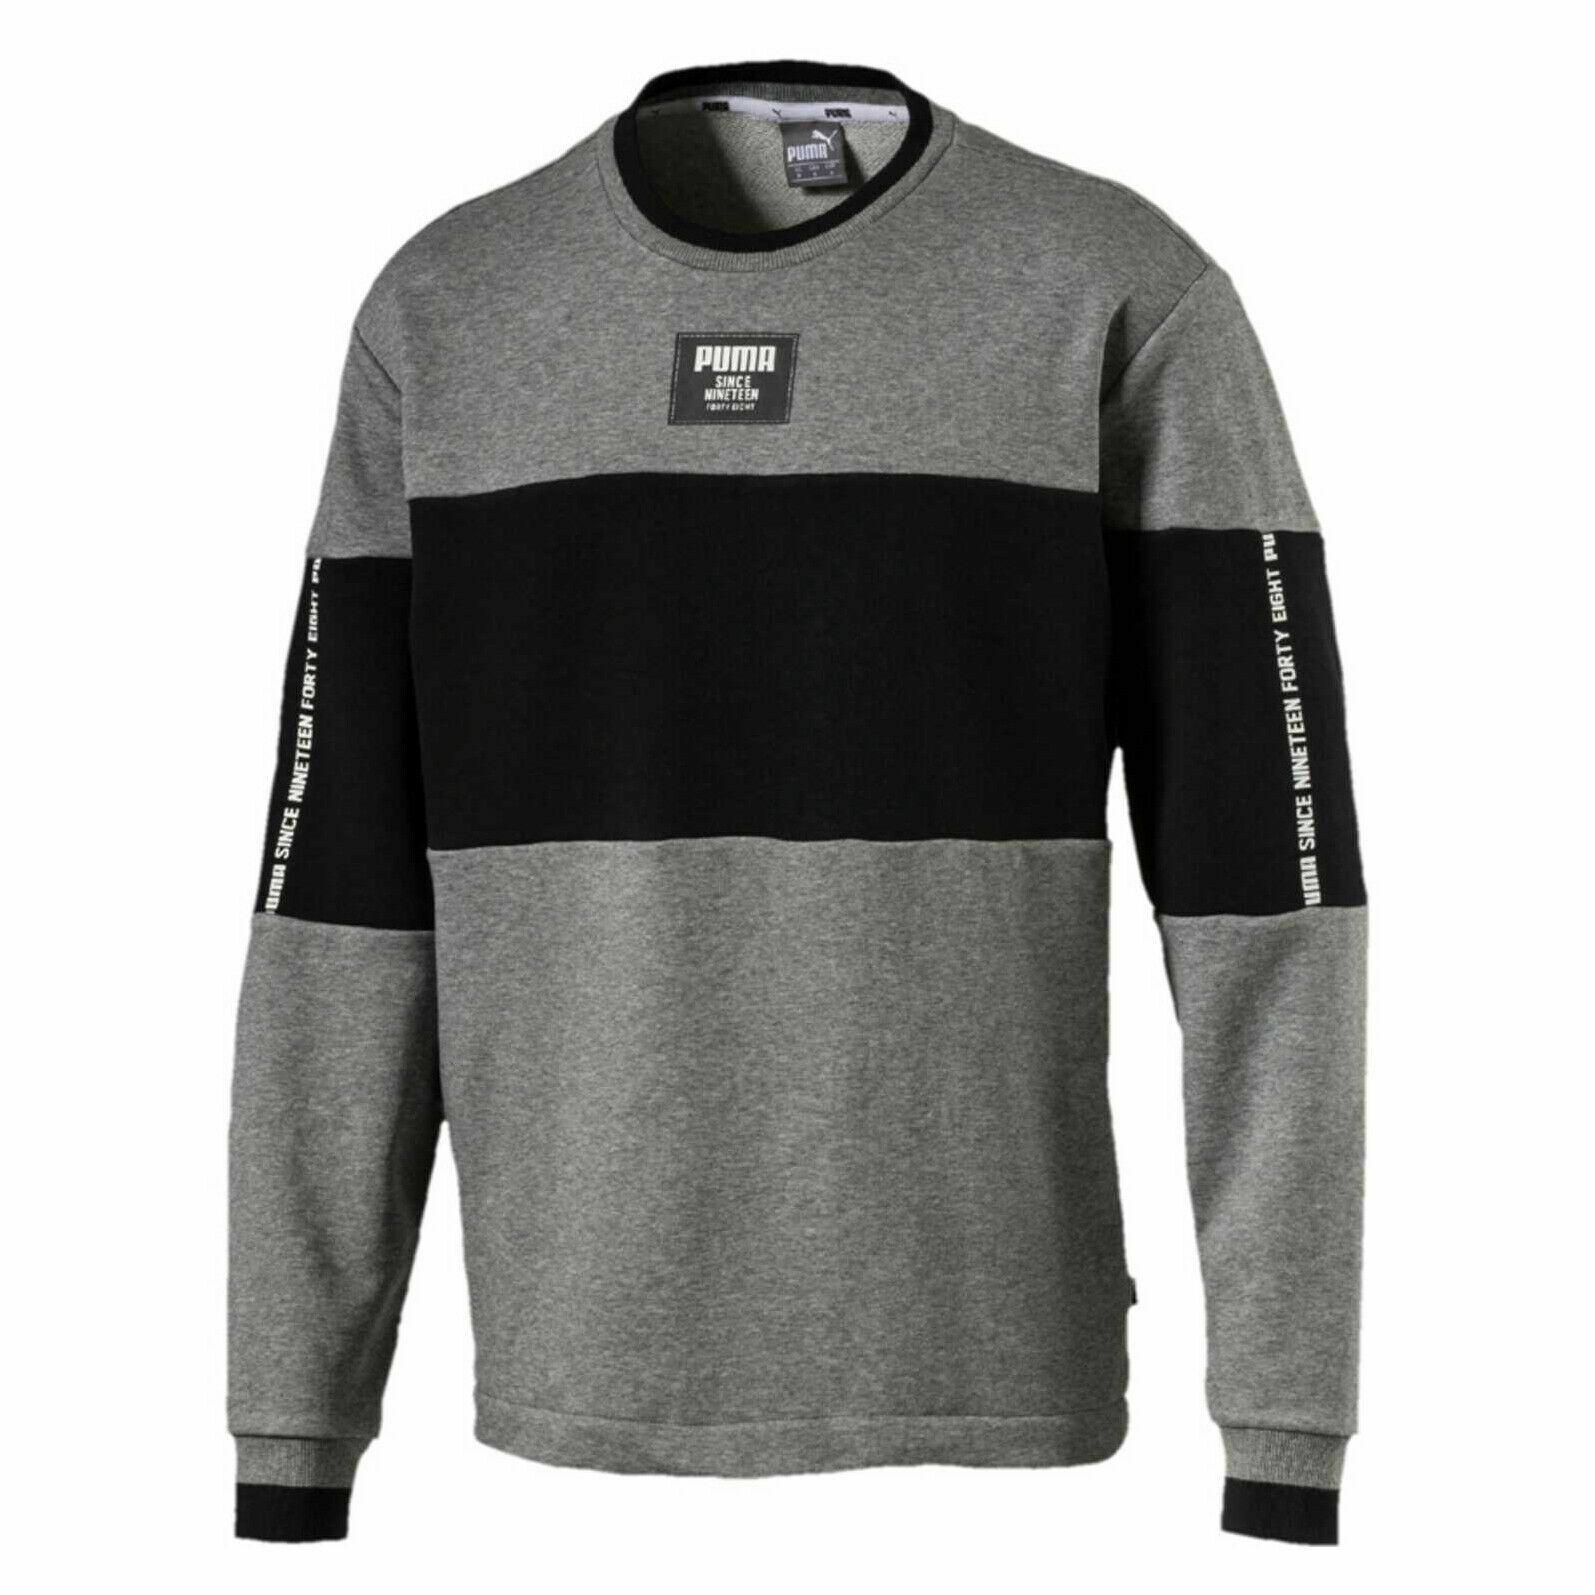 Puma Mens Rebel Block Crew Sweatshirt Grey Jumper 853266 03